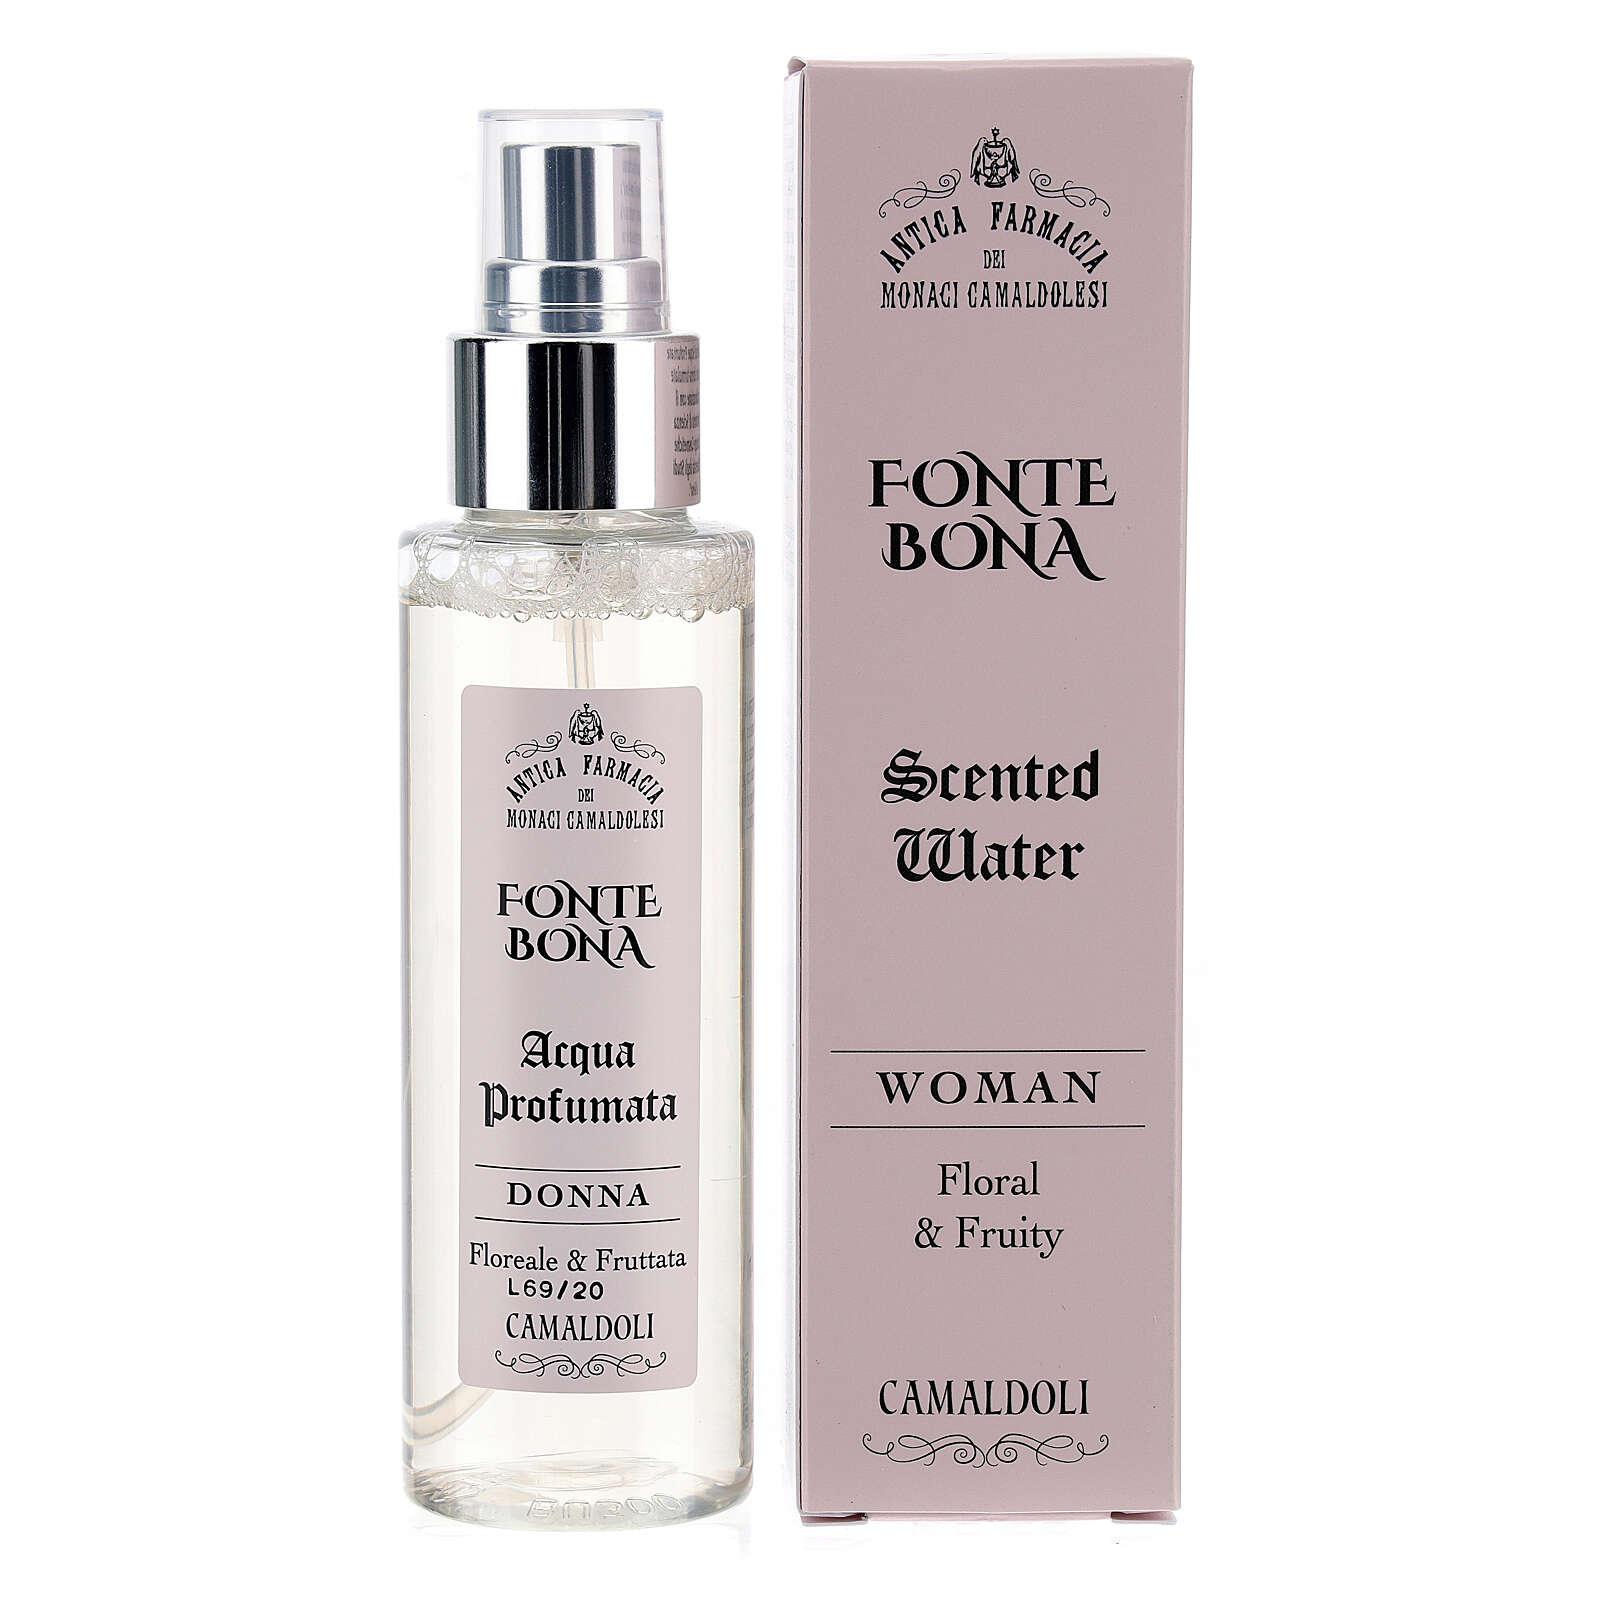 Acqua profumata donna Camaldoli fruttata 100 ml 4